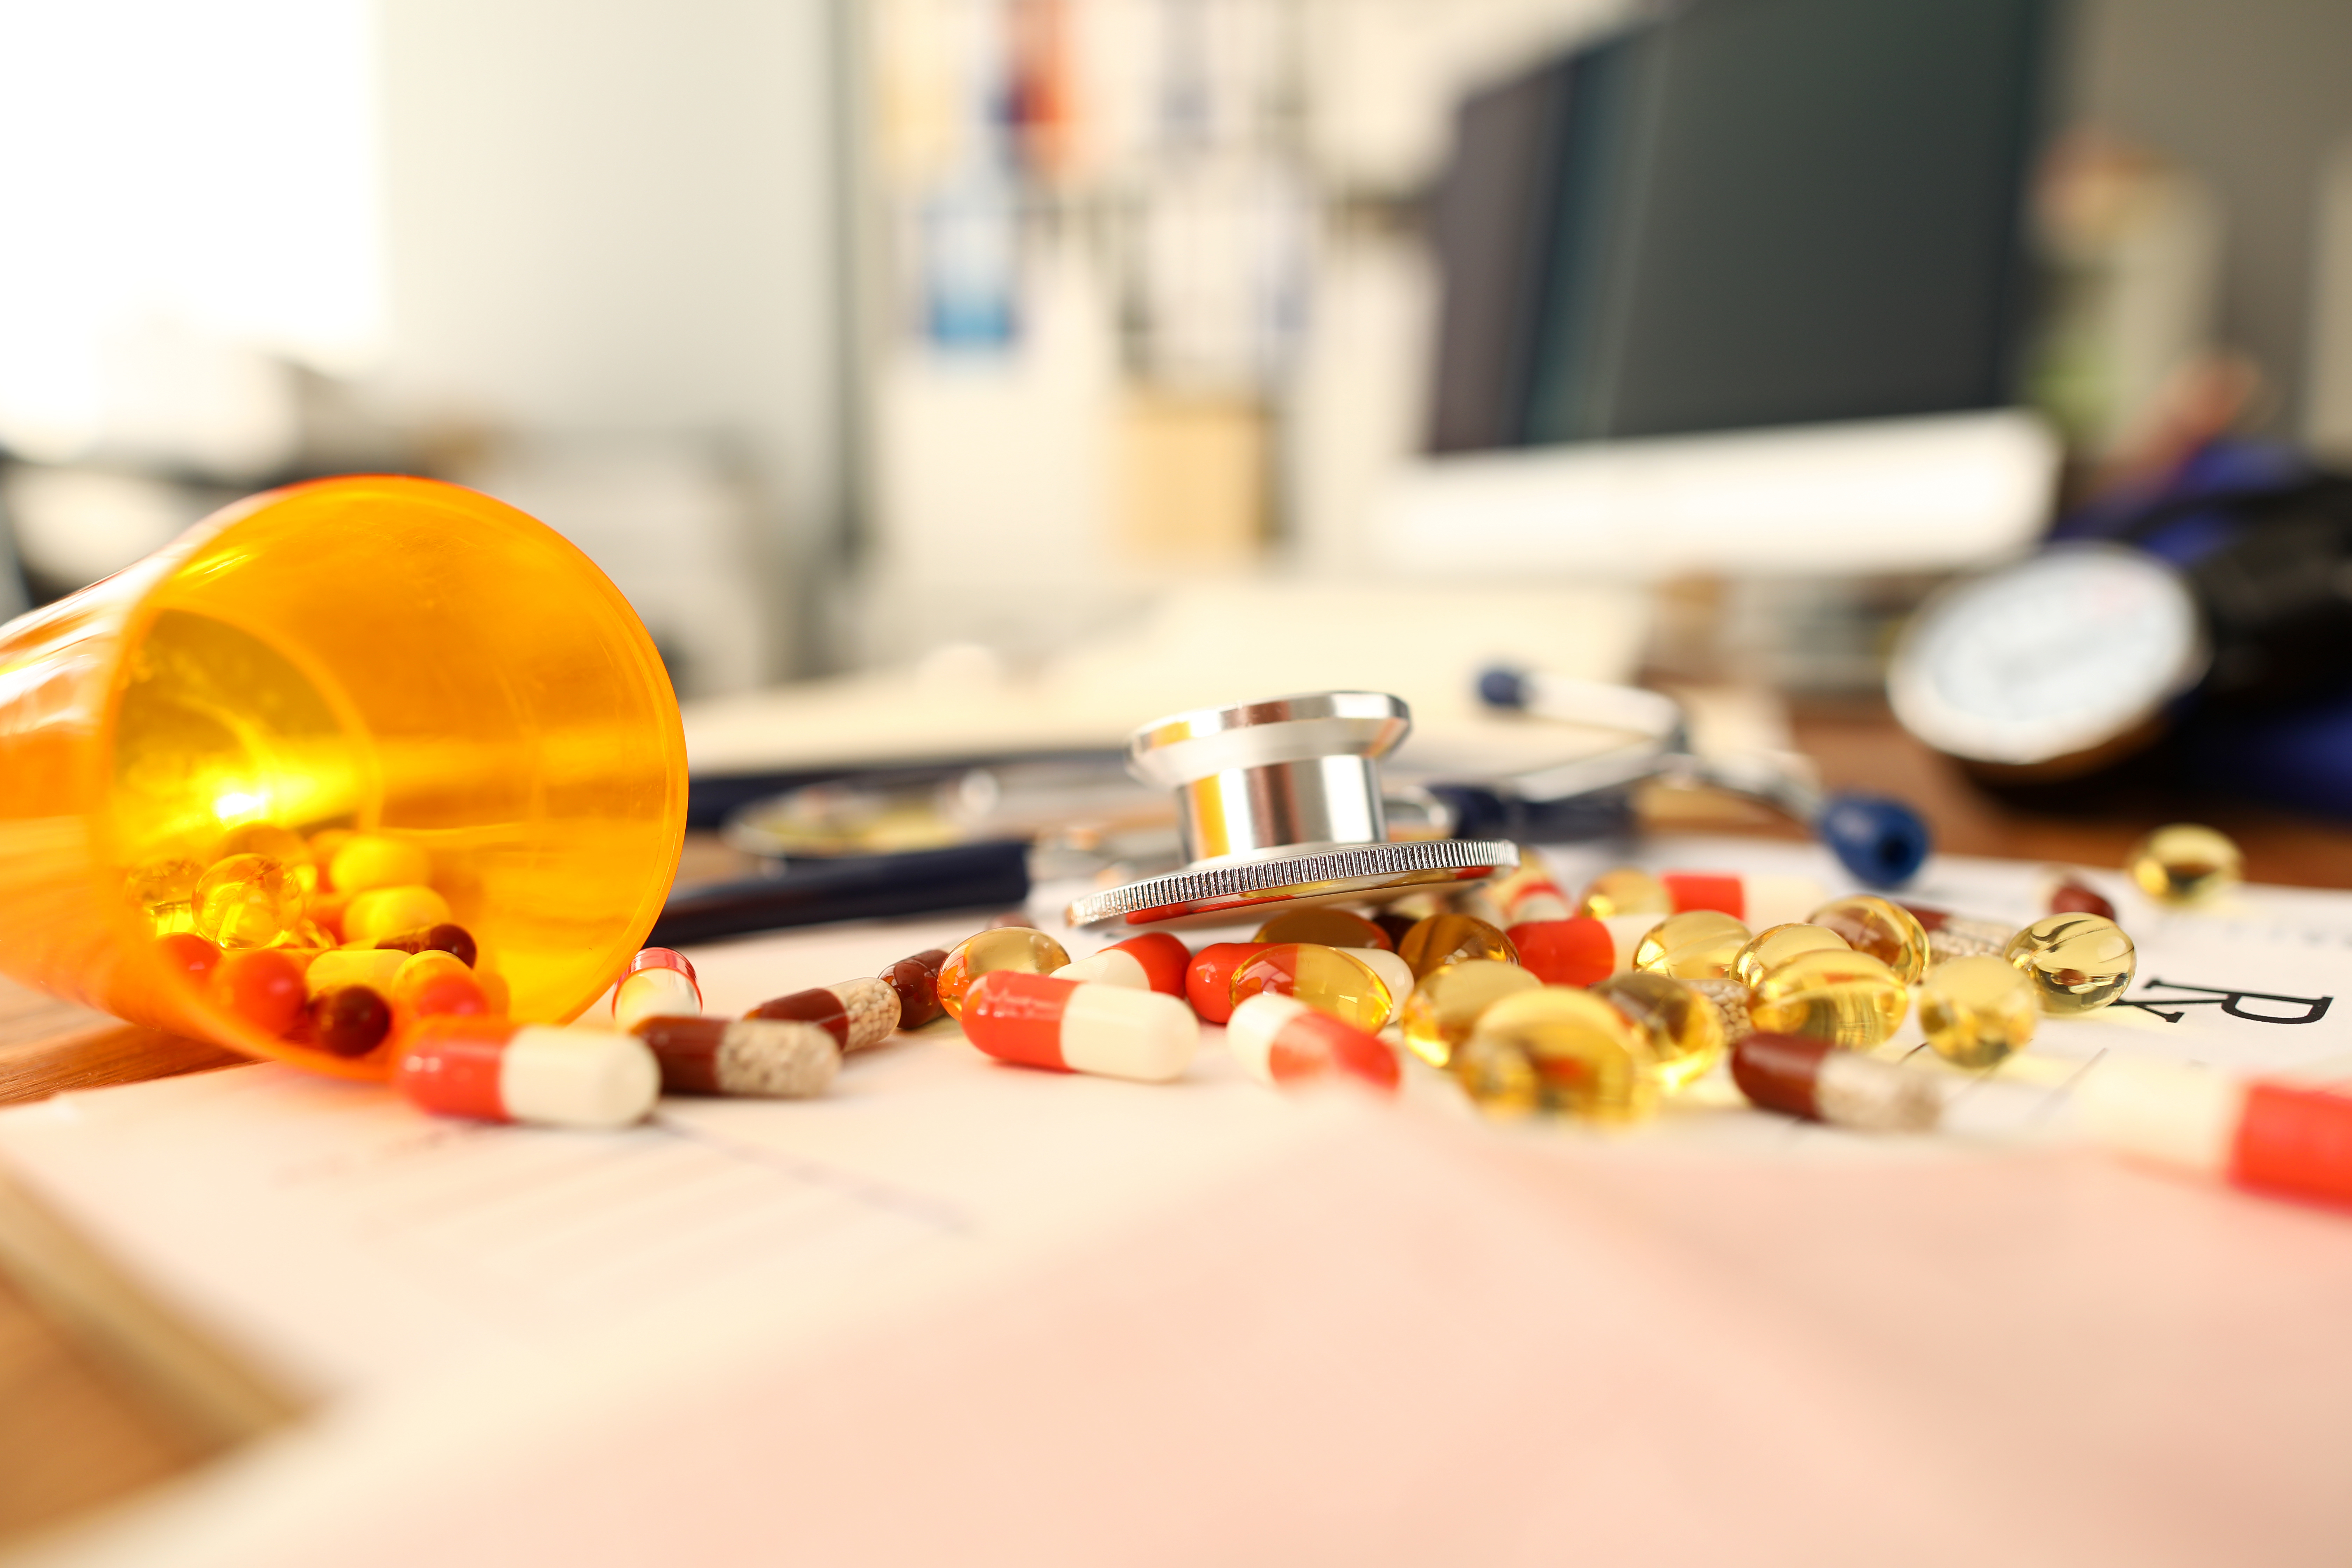 TRAINING COMPLIANCE na Indústria Farmacêutica